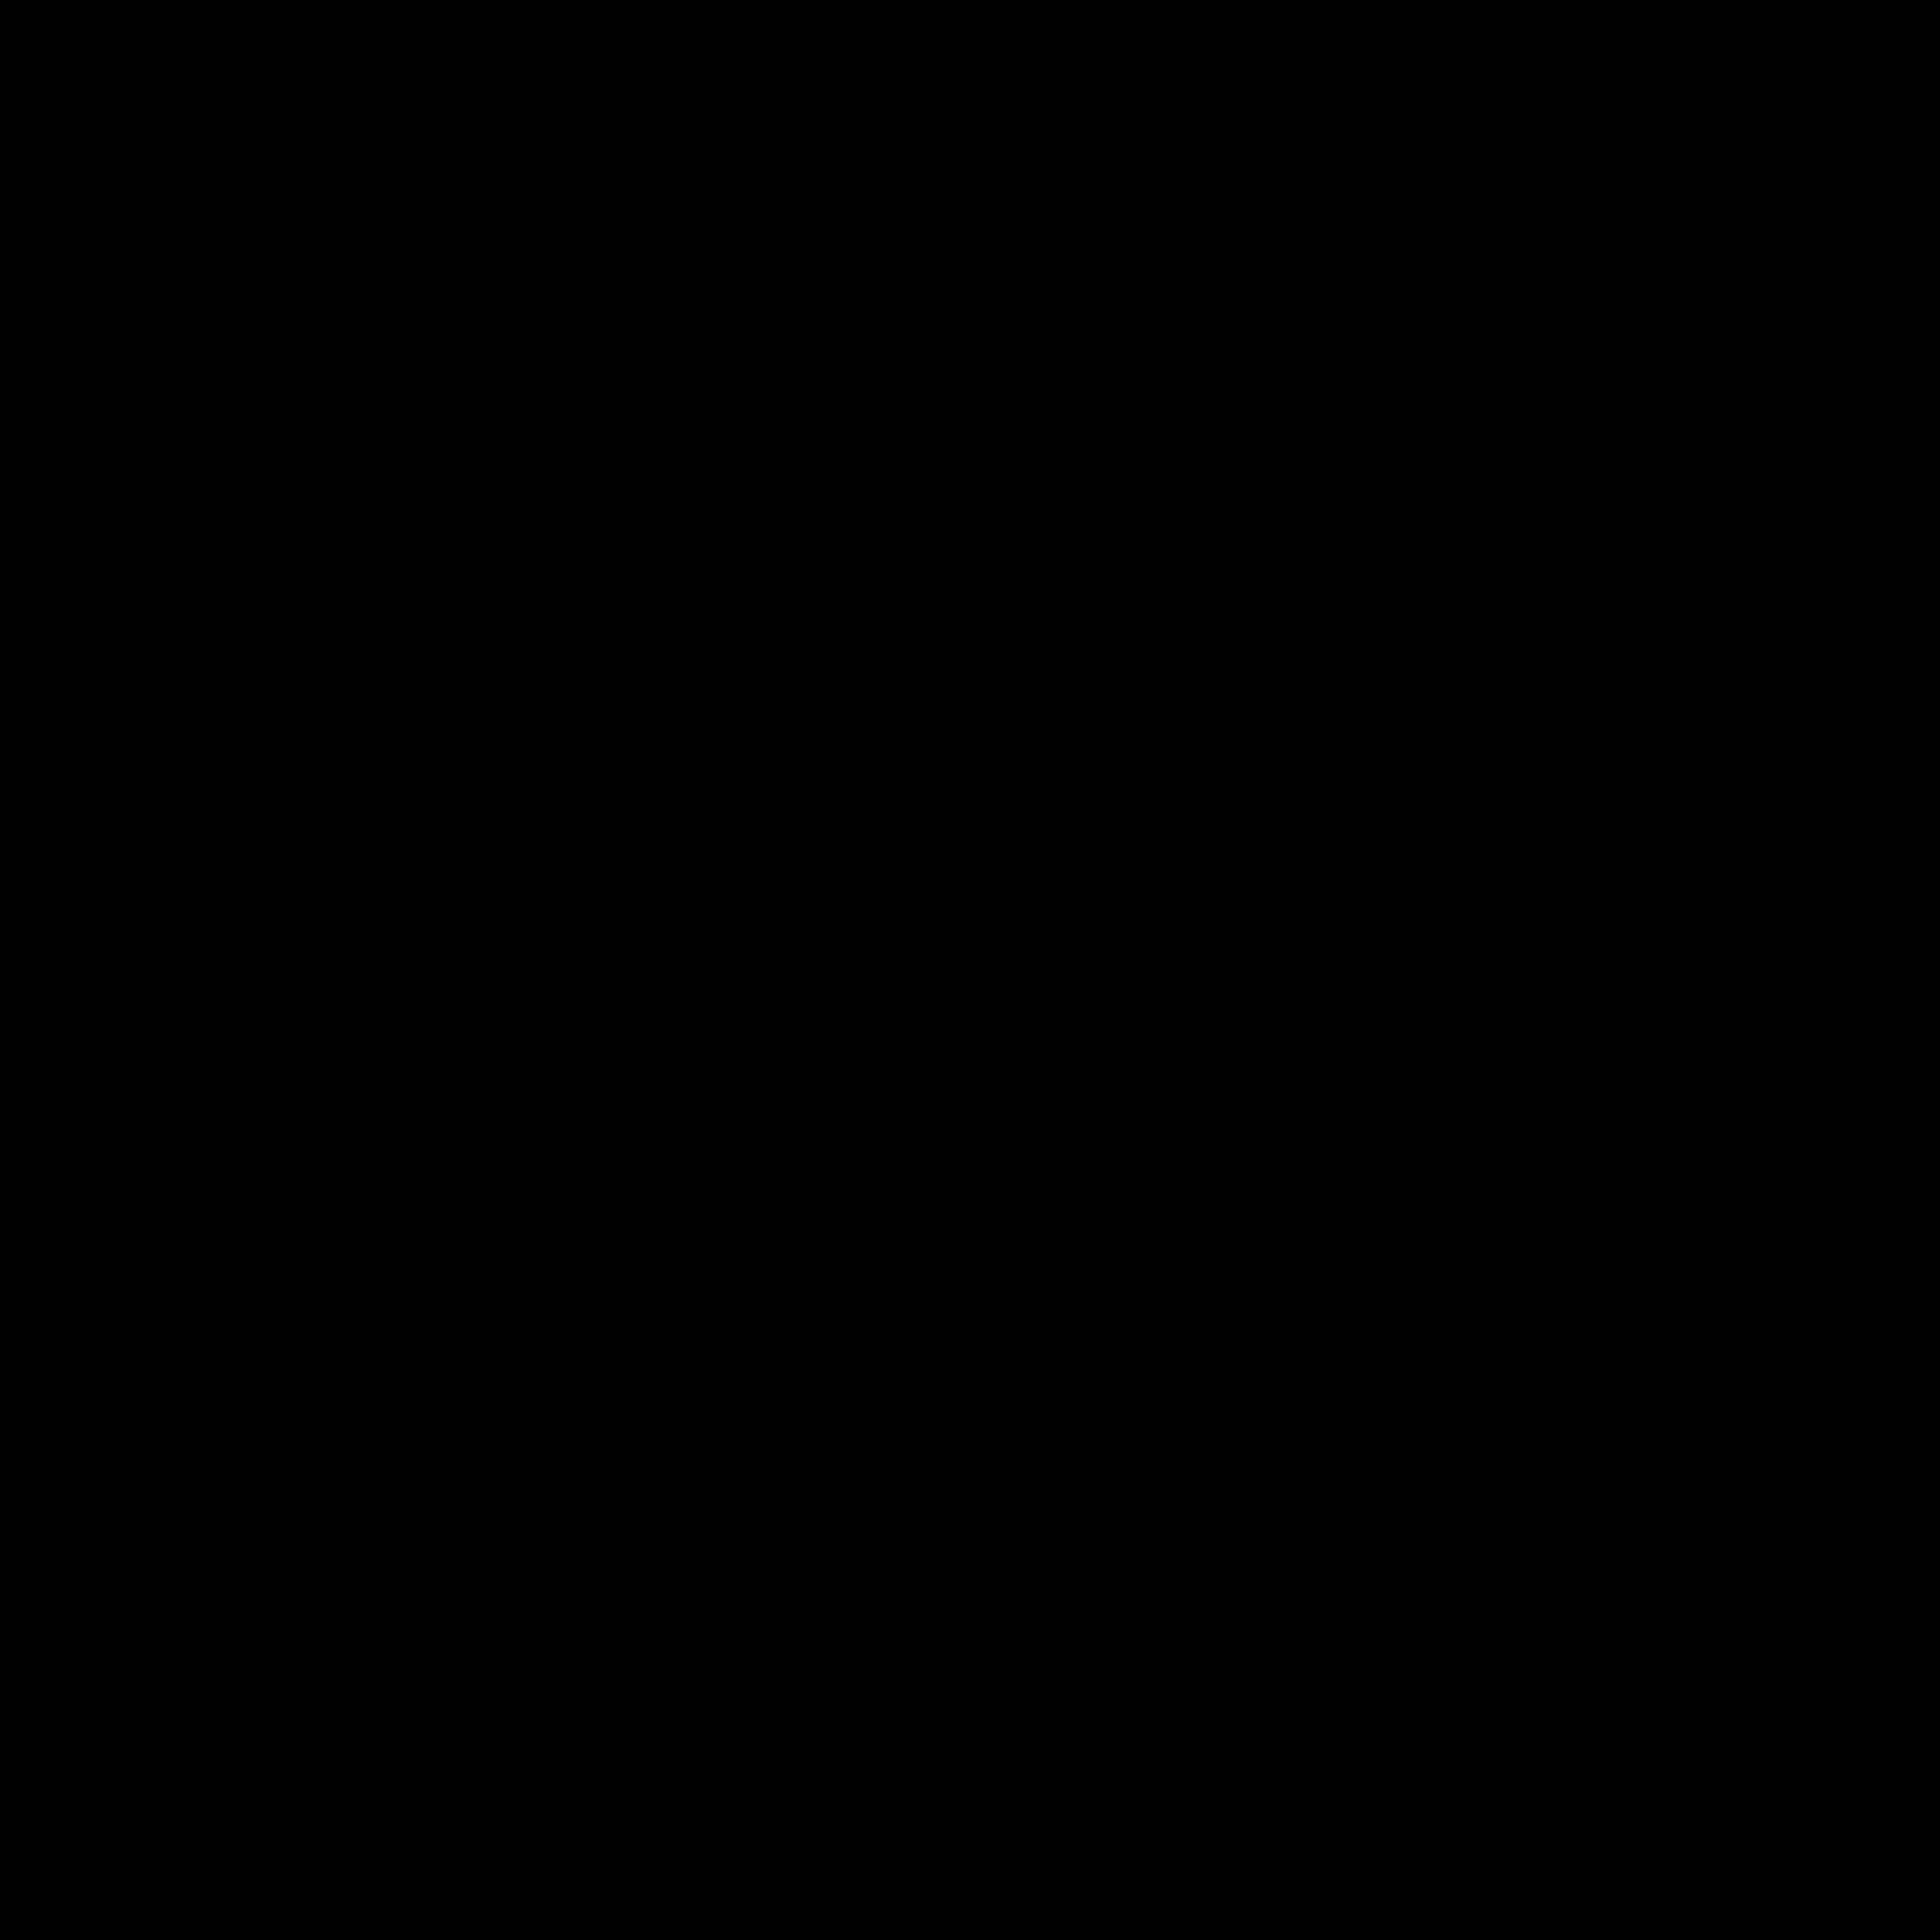 Folder clipart flat. File simpleicons interface black